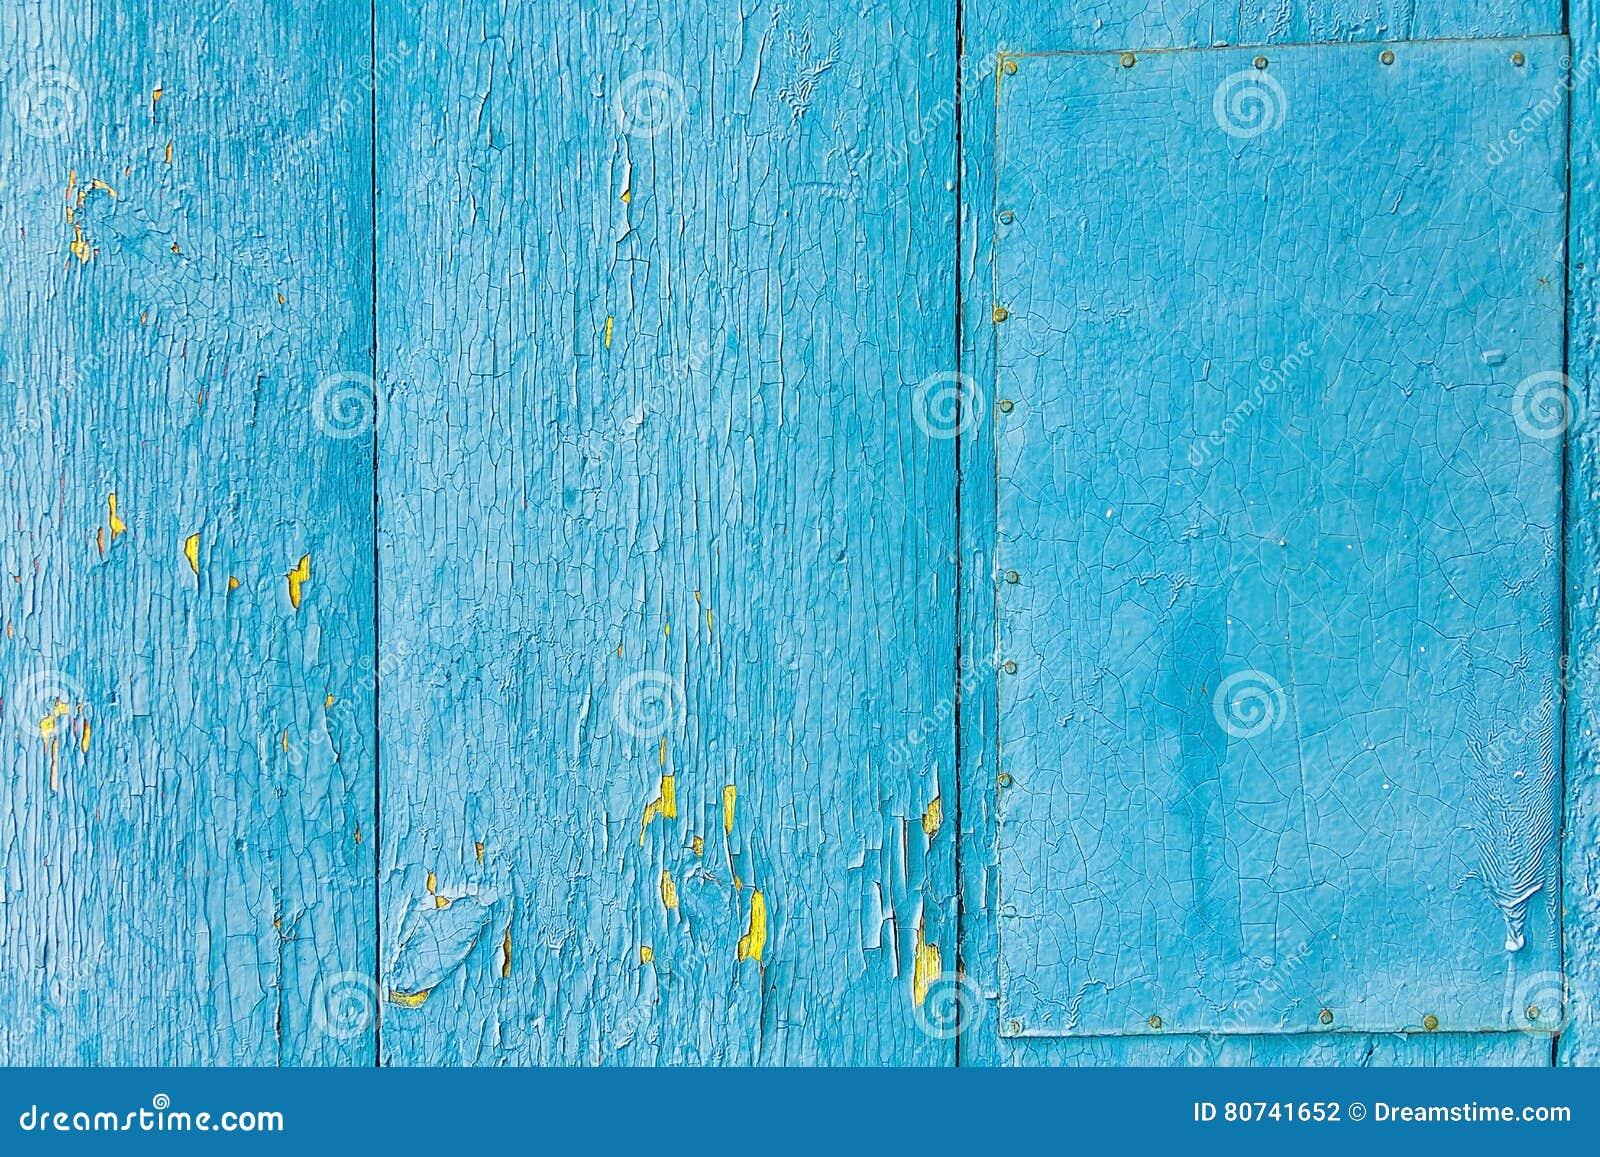 vintage blue wood background - photo #23